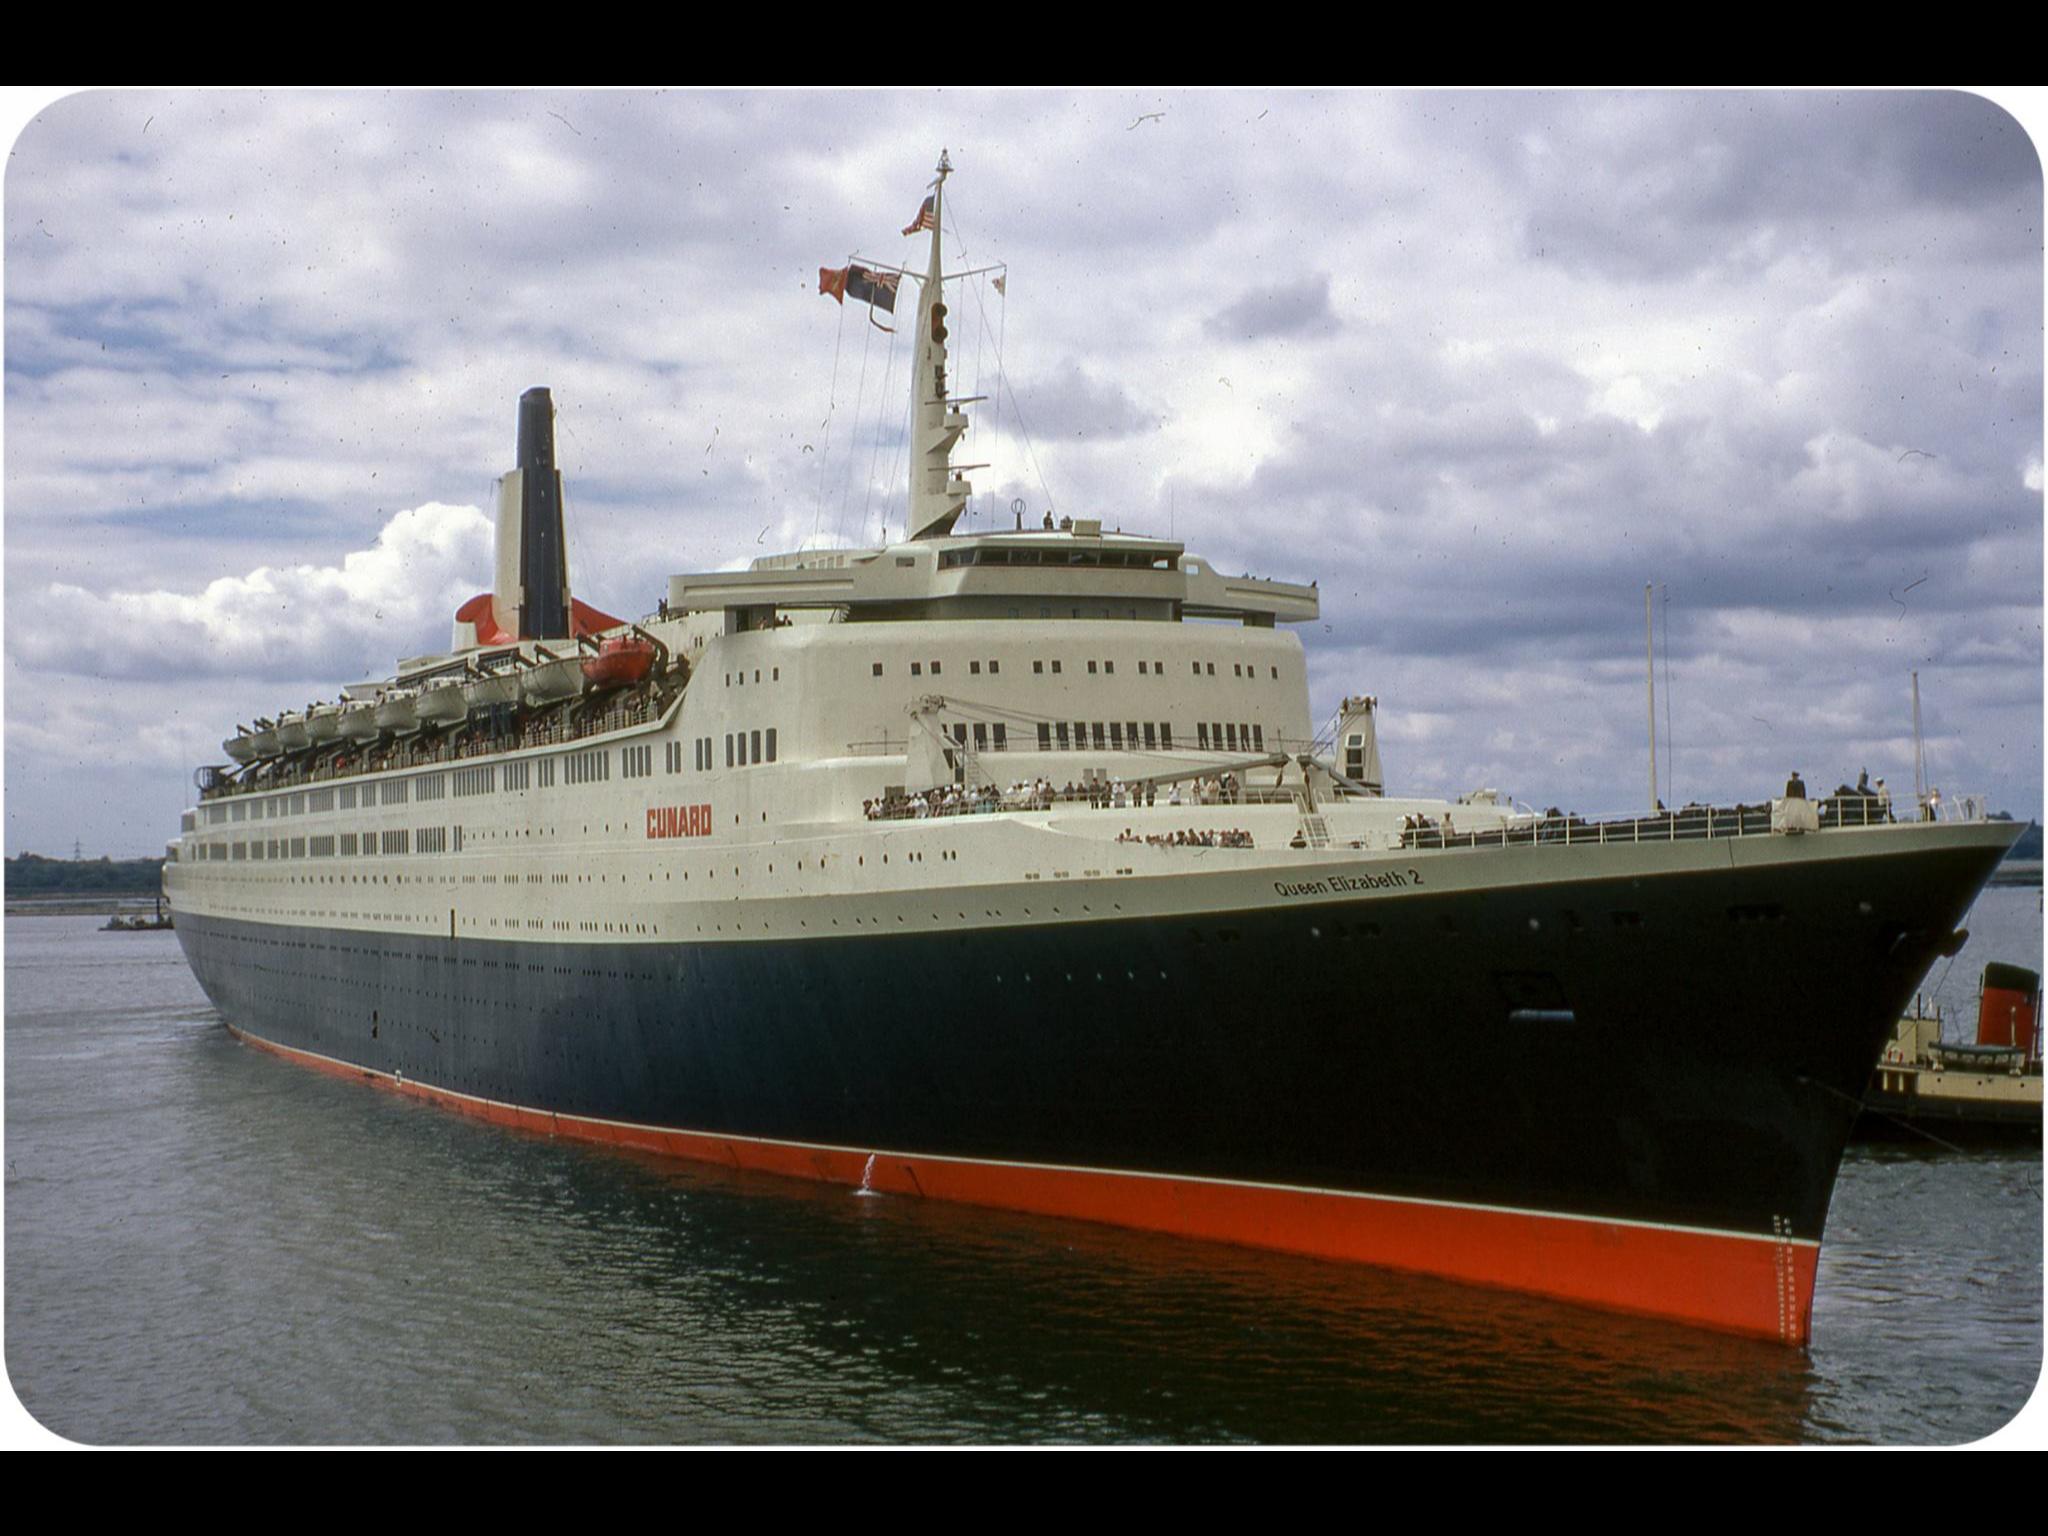 Pin By Oceanic House On Cunard Qe2 Cruise Ship Cunard Line Cunard